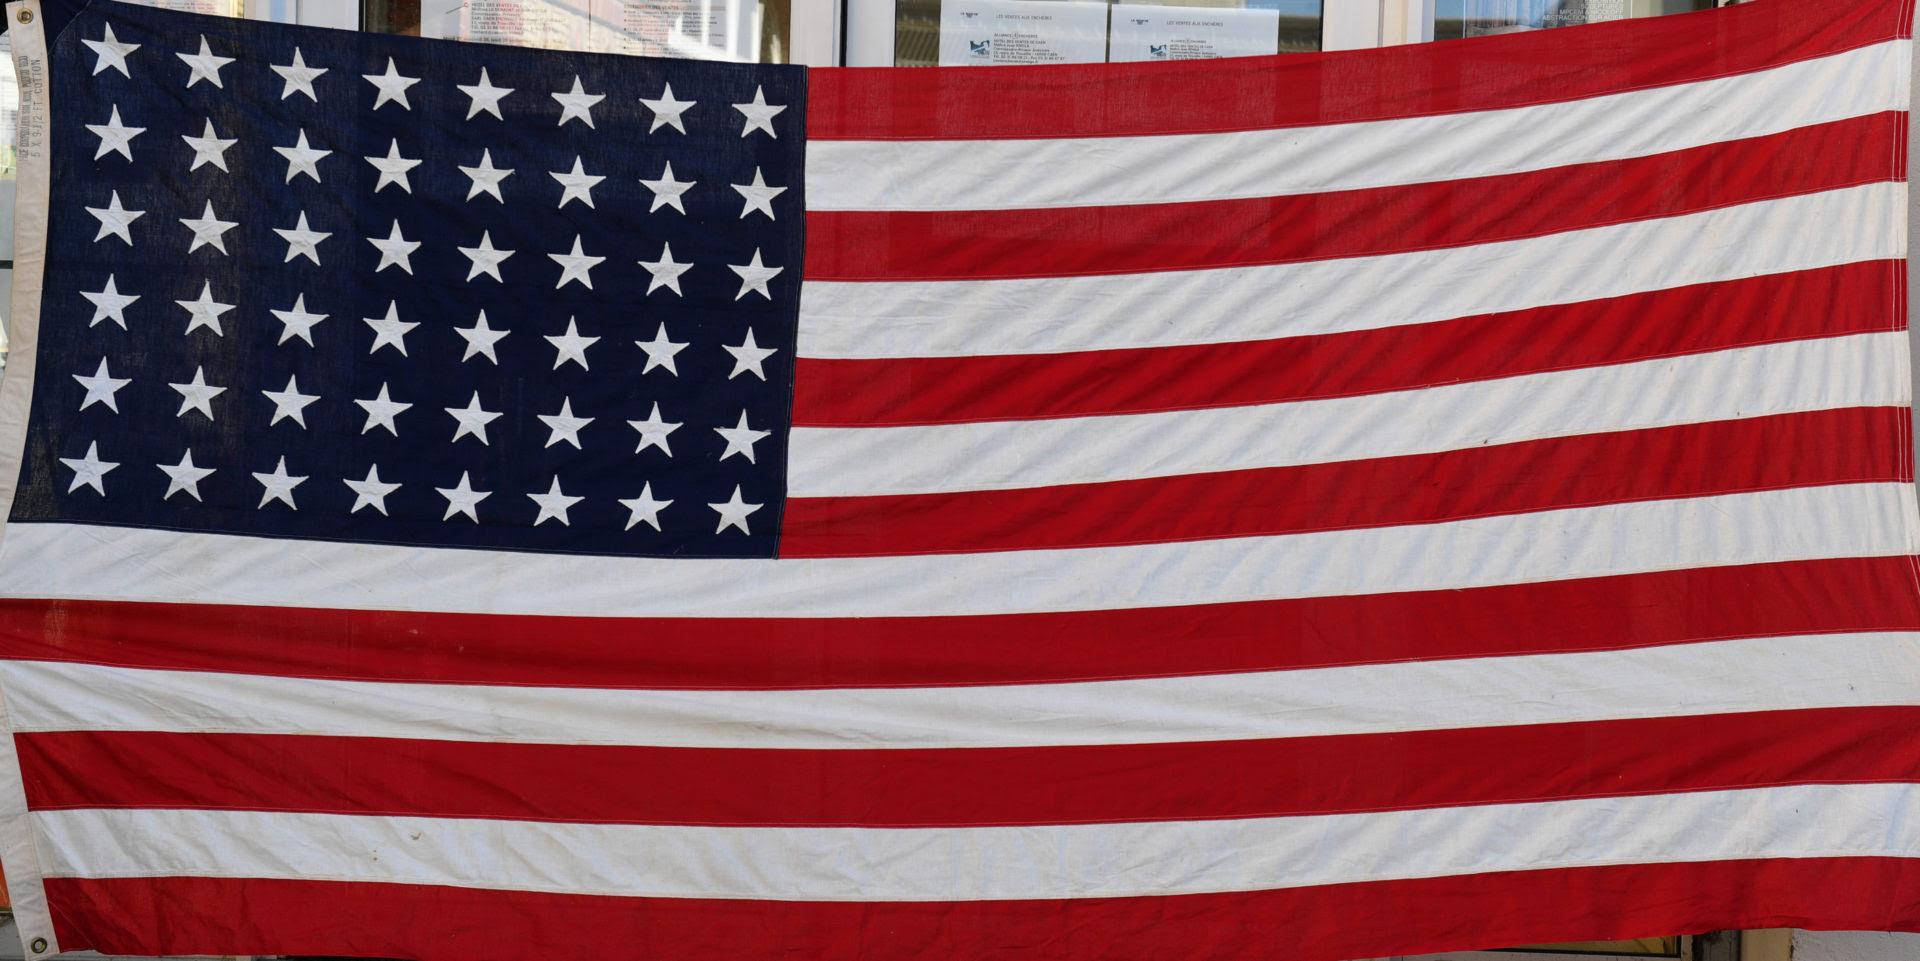 Drapeau Américain 48 étoiles En Tissu Coton Blancrougebleu